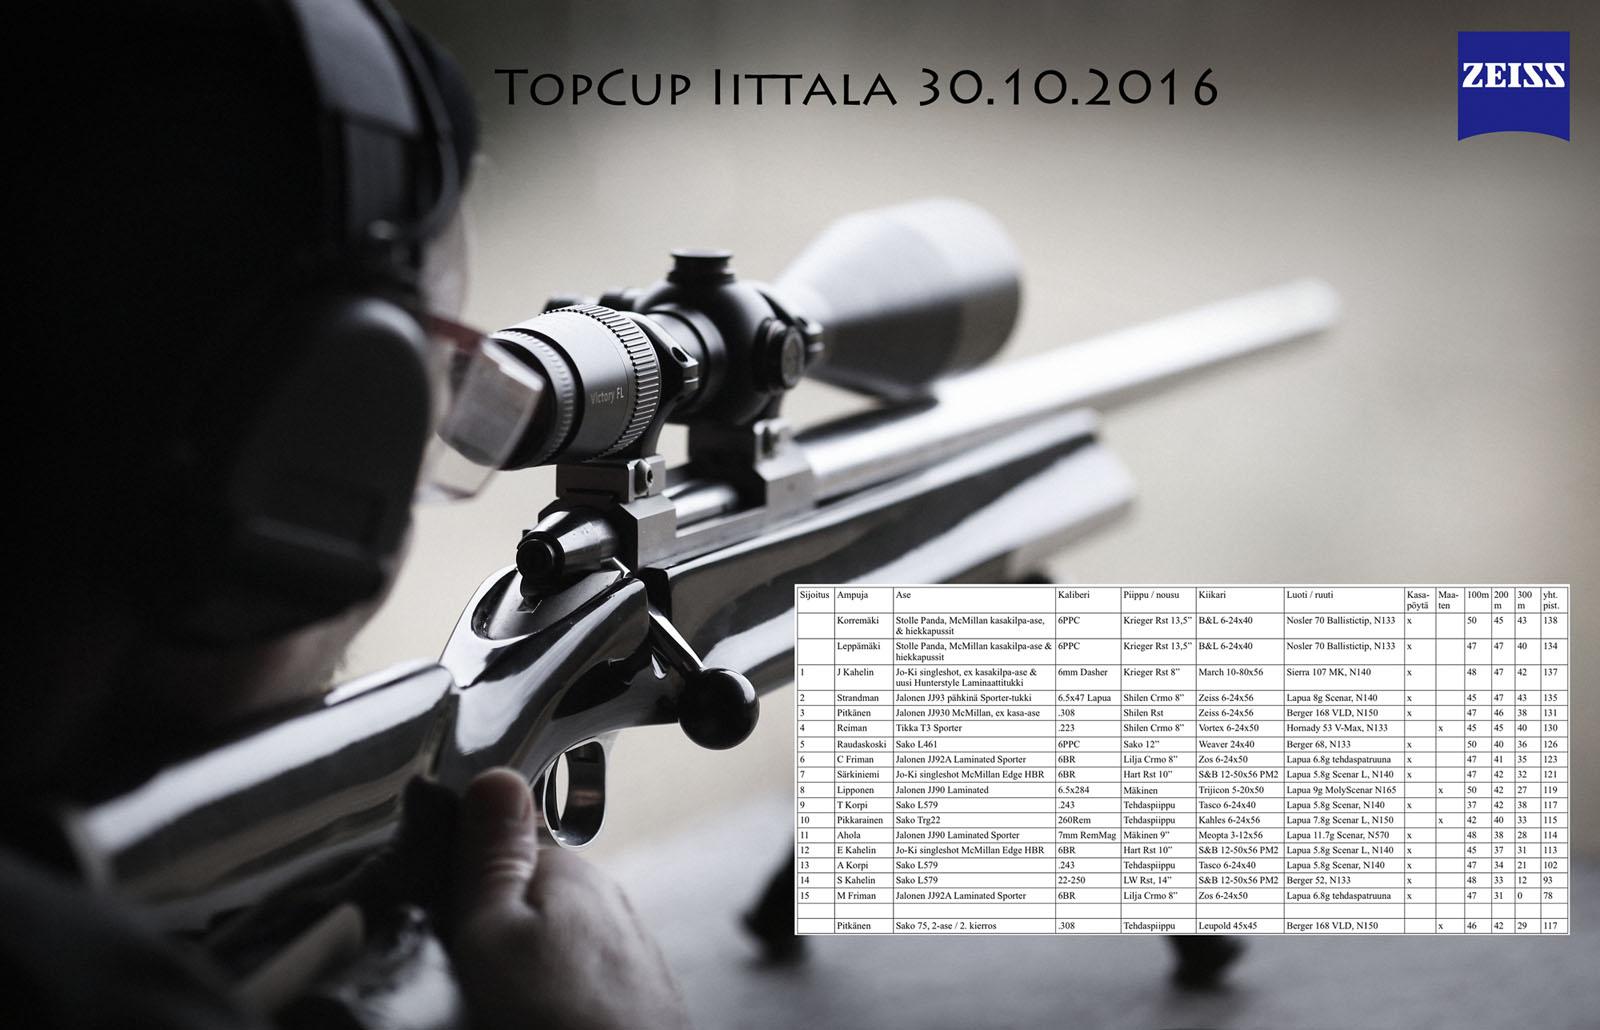 topcup1-1